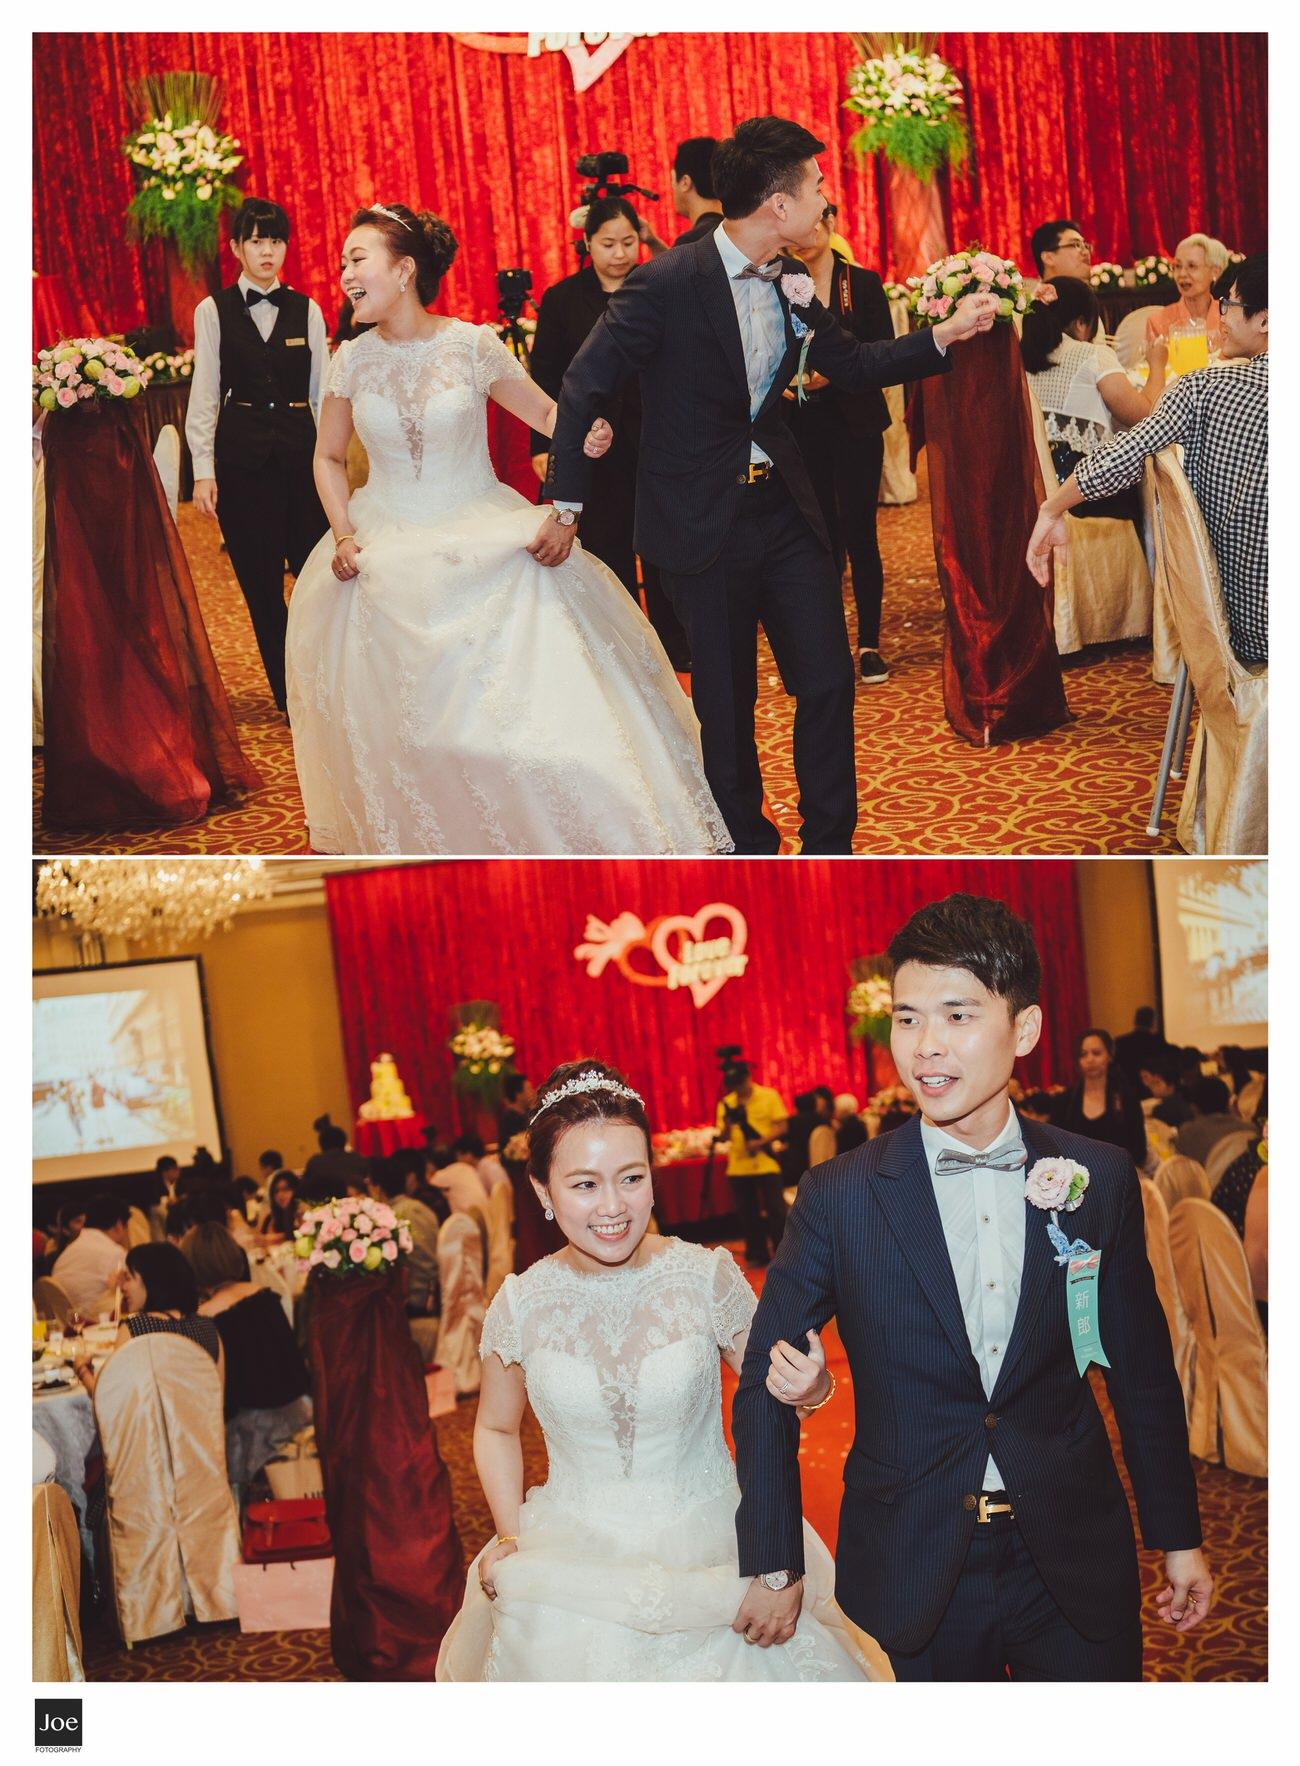 sunworld-dynasty-hotel-taipei-wedding-photo-joe-fotography-angel-jay-091.jpg